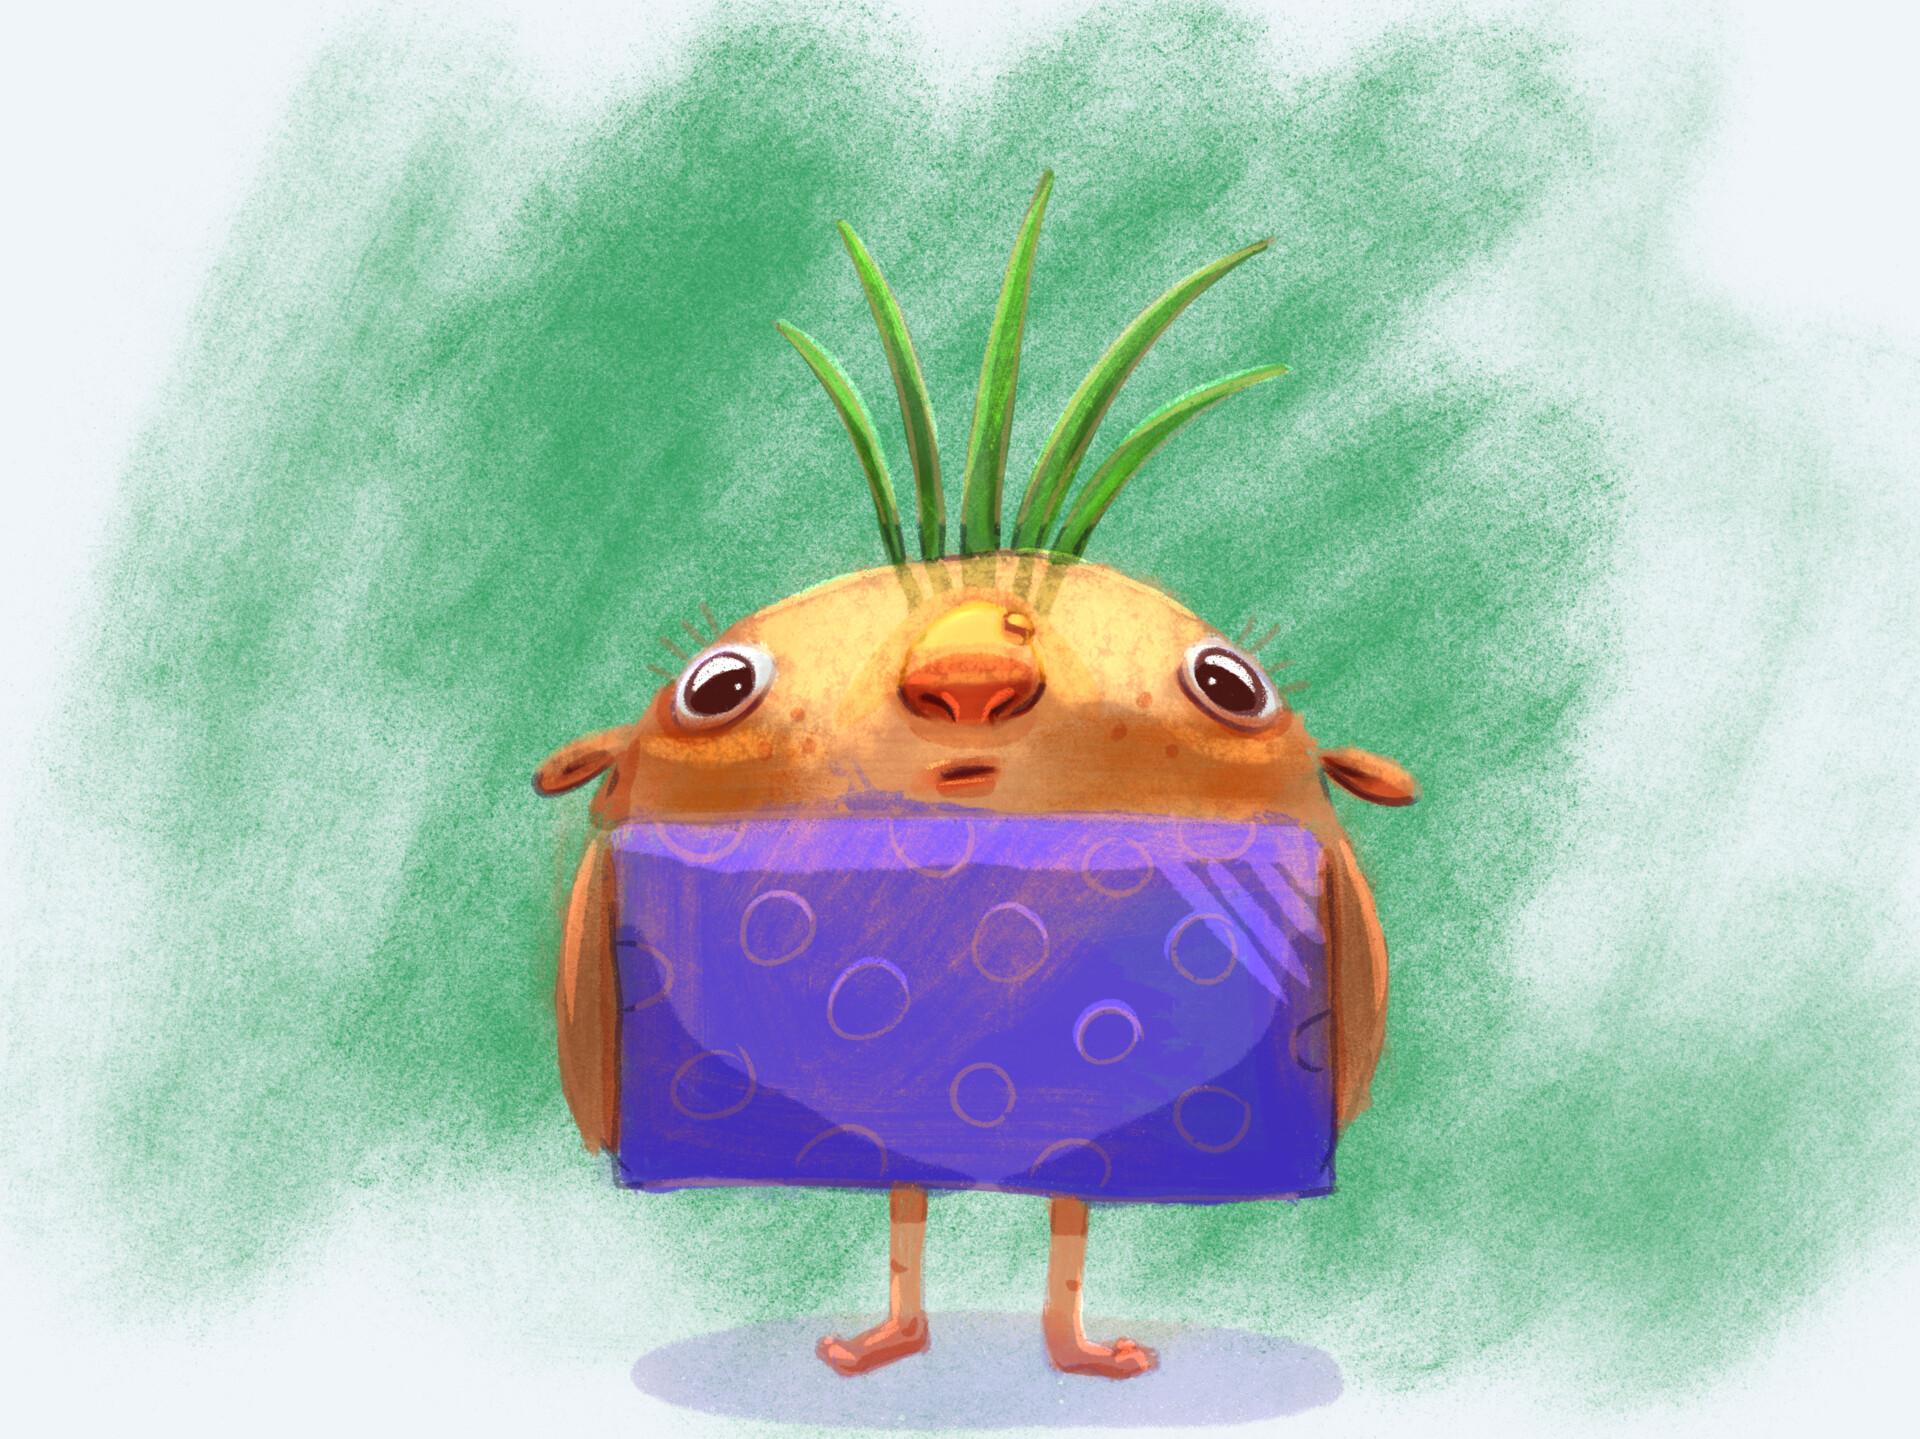 Mccal joy turnip painted